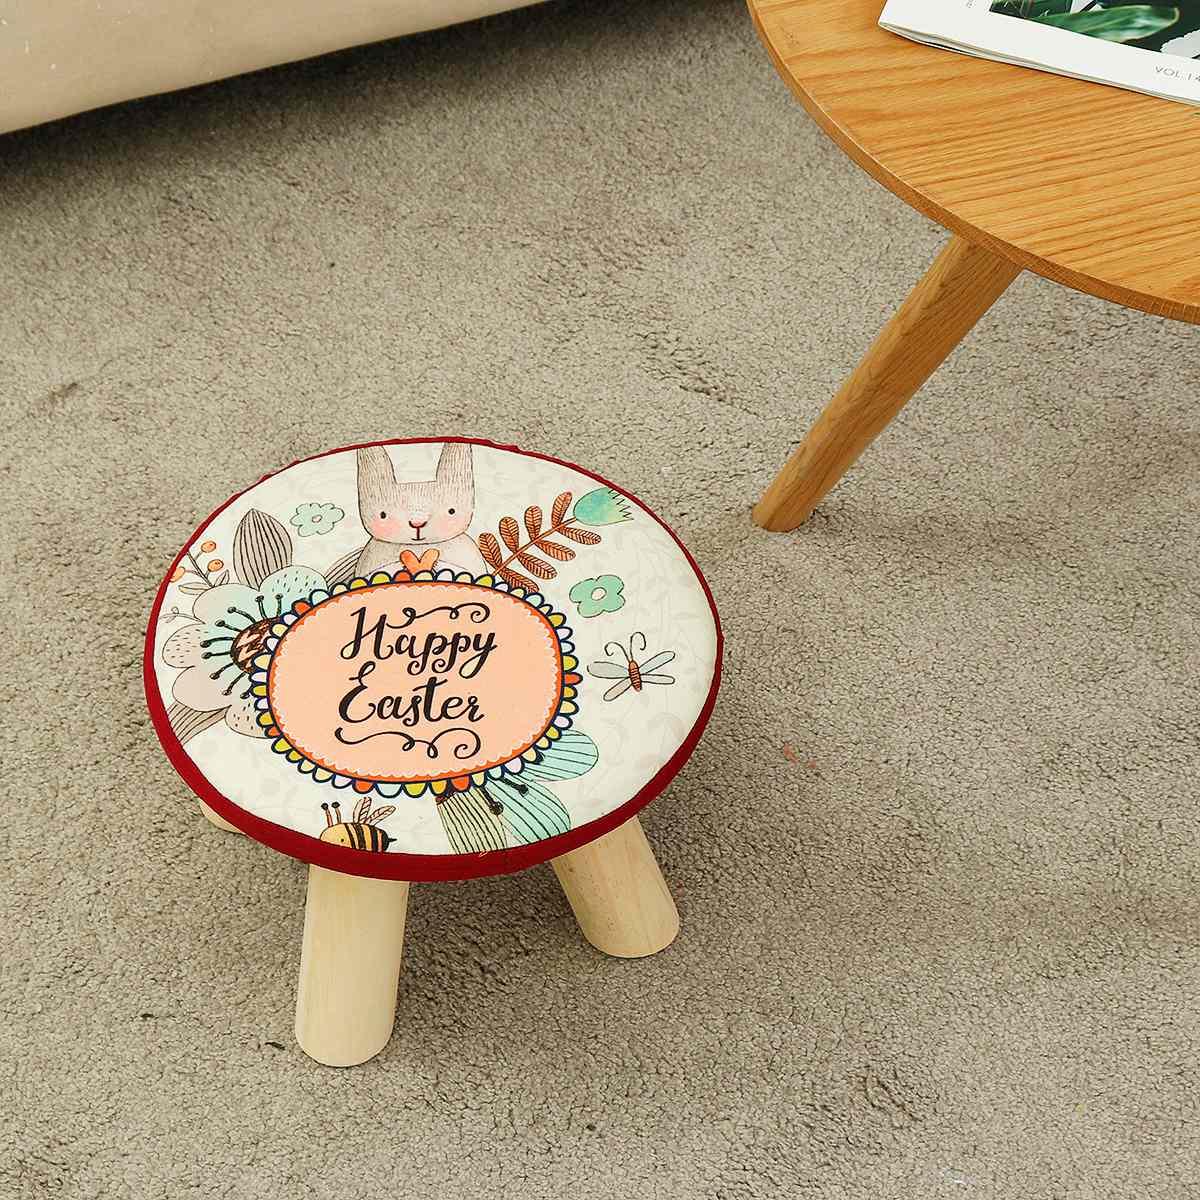 New Fashion Home Sofa Round Stool Cloth Art Living Room Tea Table Mound Wooden Creative Small Foot Stools Saddle Kids Stool Benc